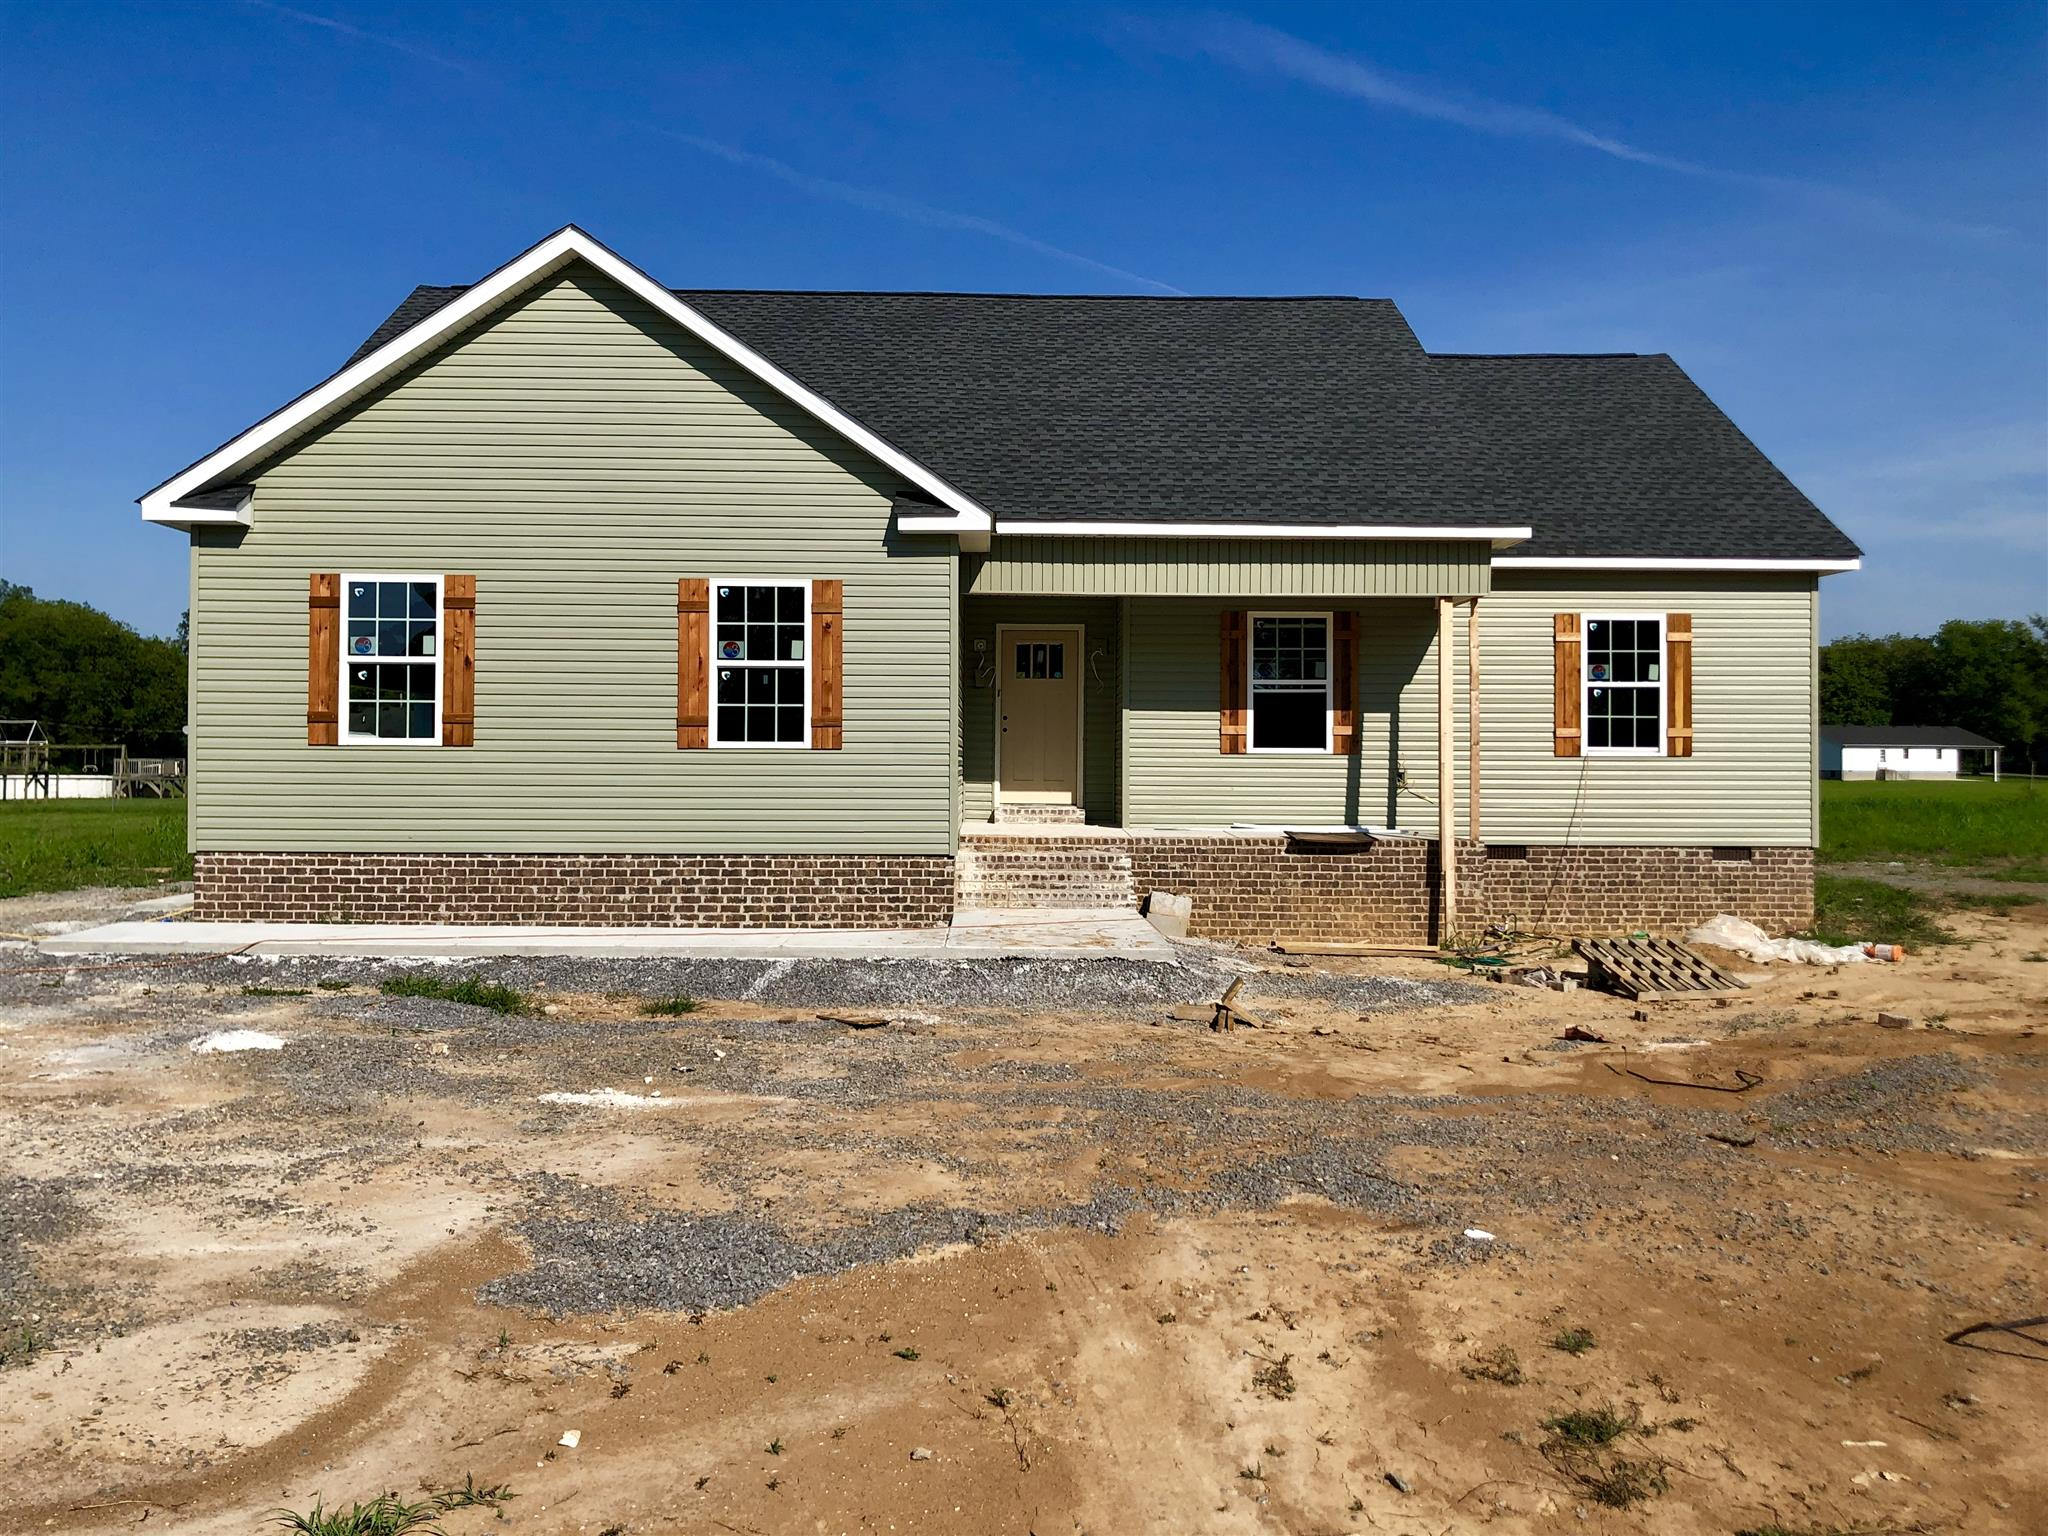 157 Hazelnut Ln, Unionville, TN 37180 - Unionville, TN real estate listing